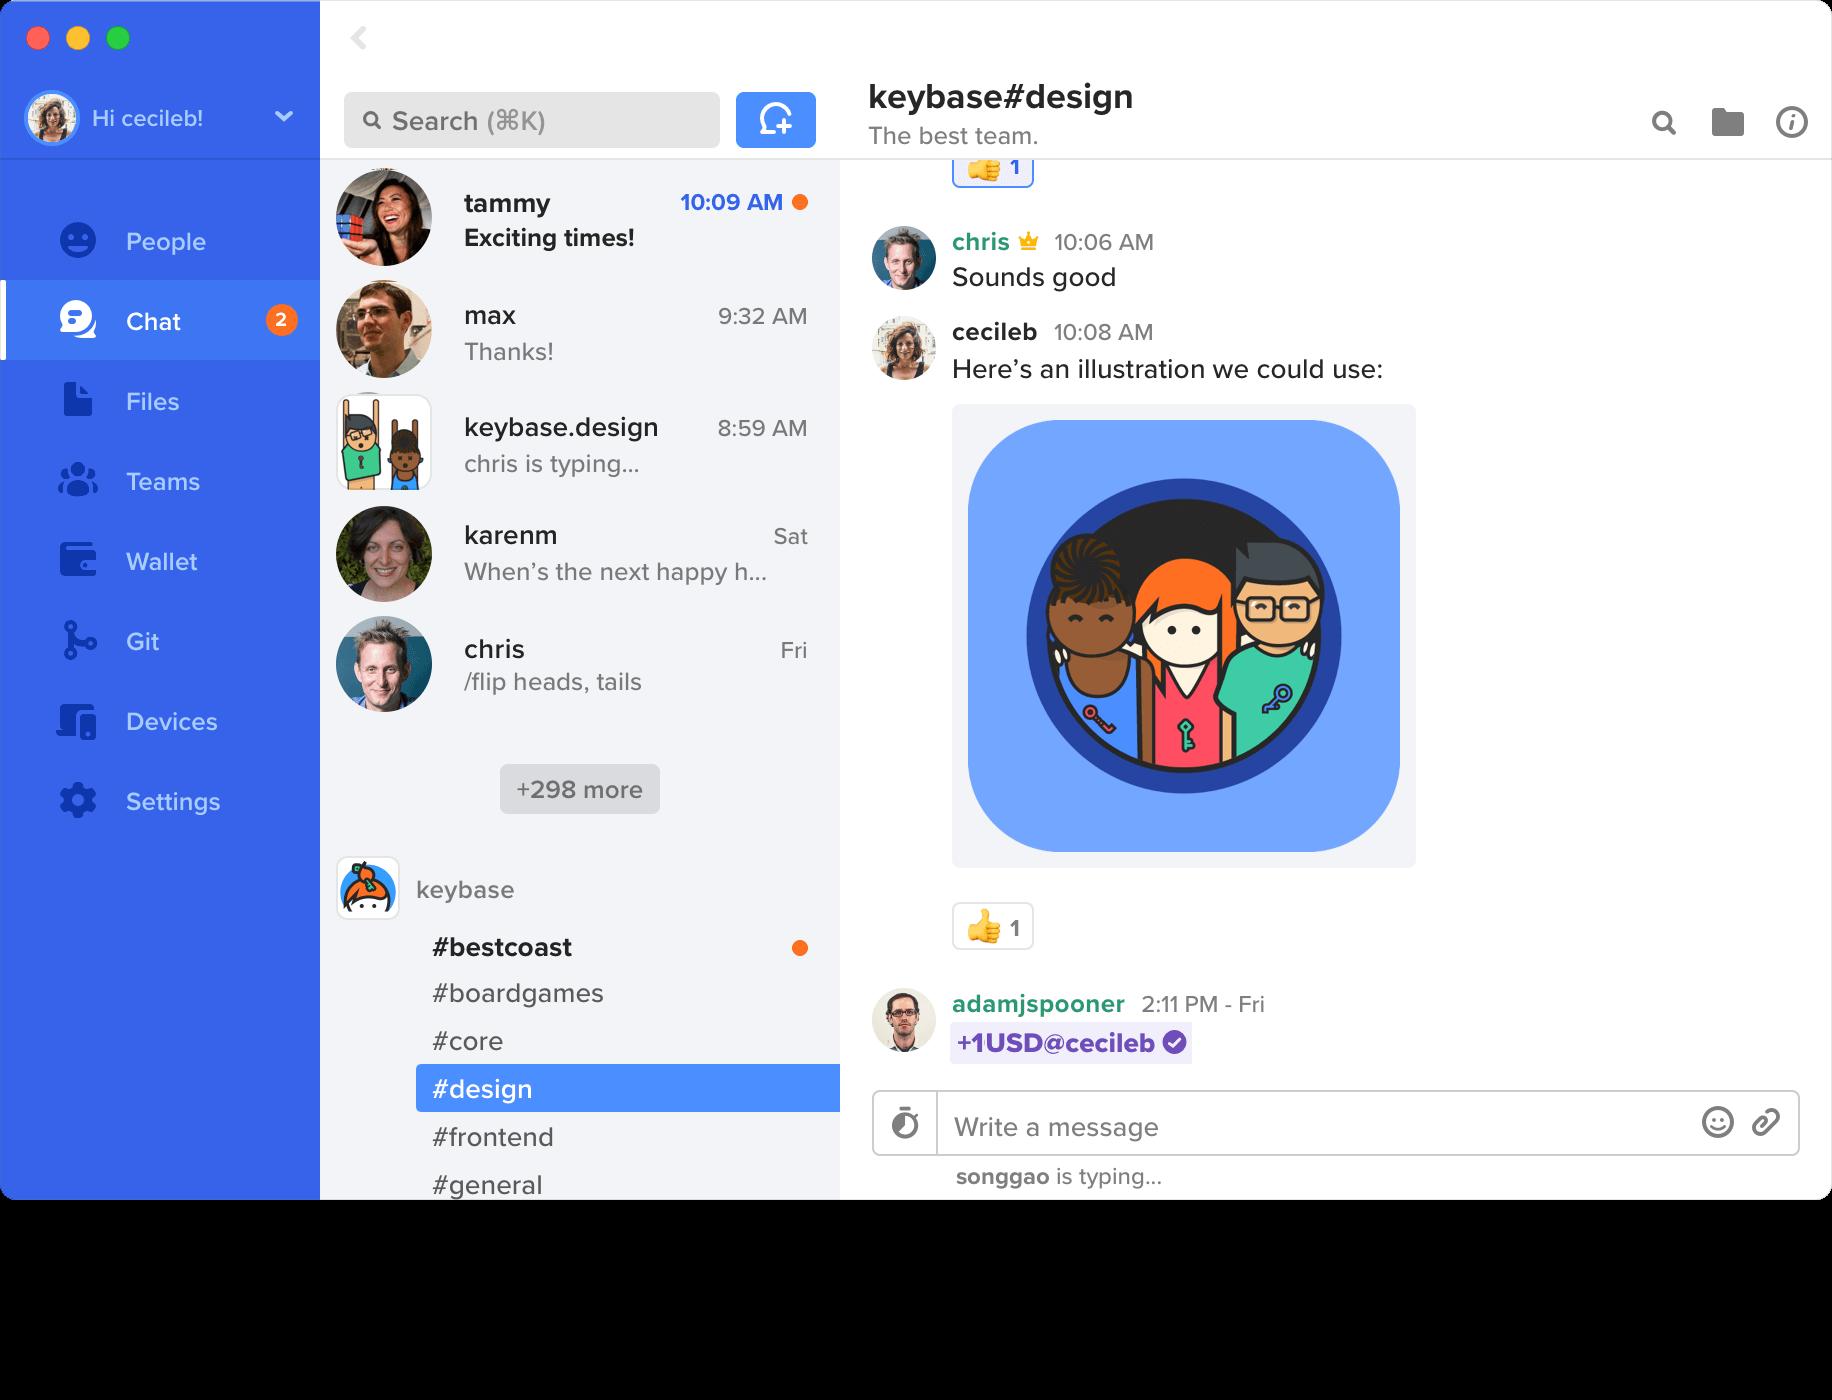 Keybase - Similar to Whatsapp